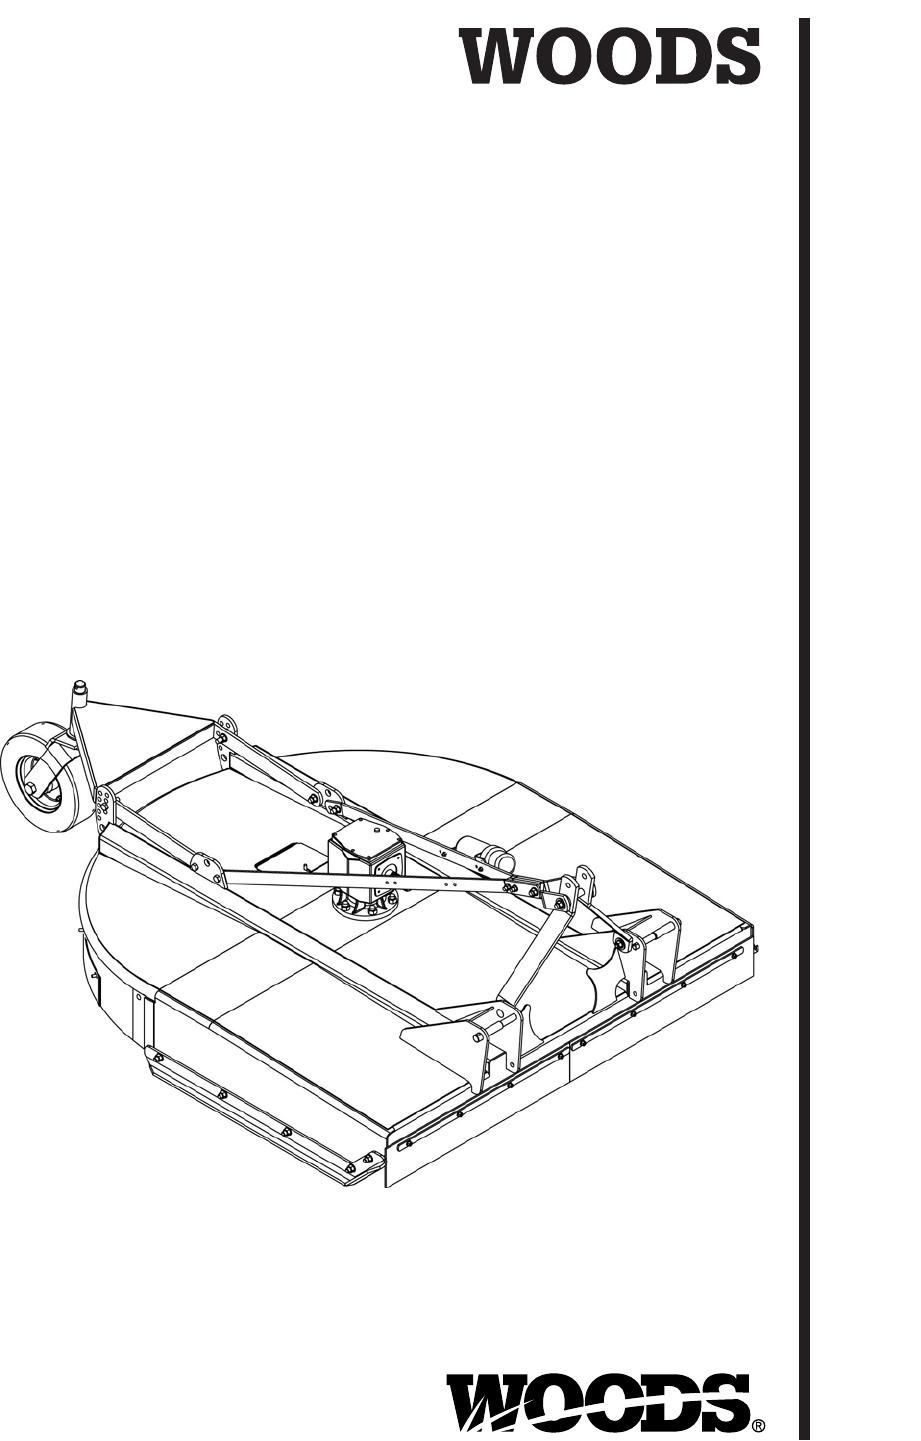 Woods Equipment BB600X, BB720X, BB840X, BB840XP manual